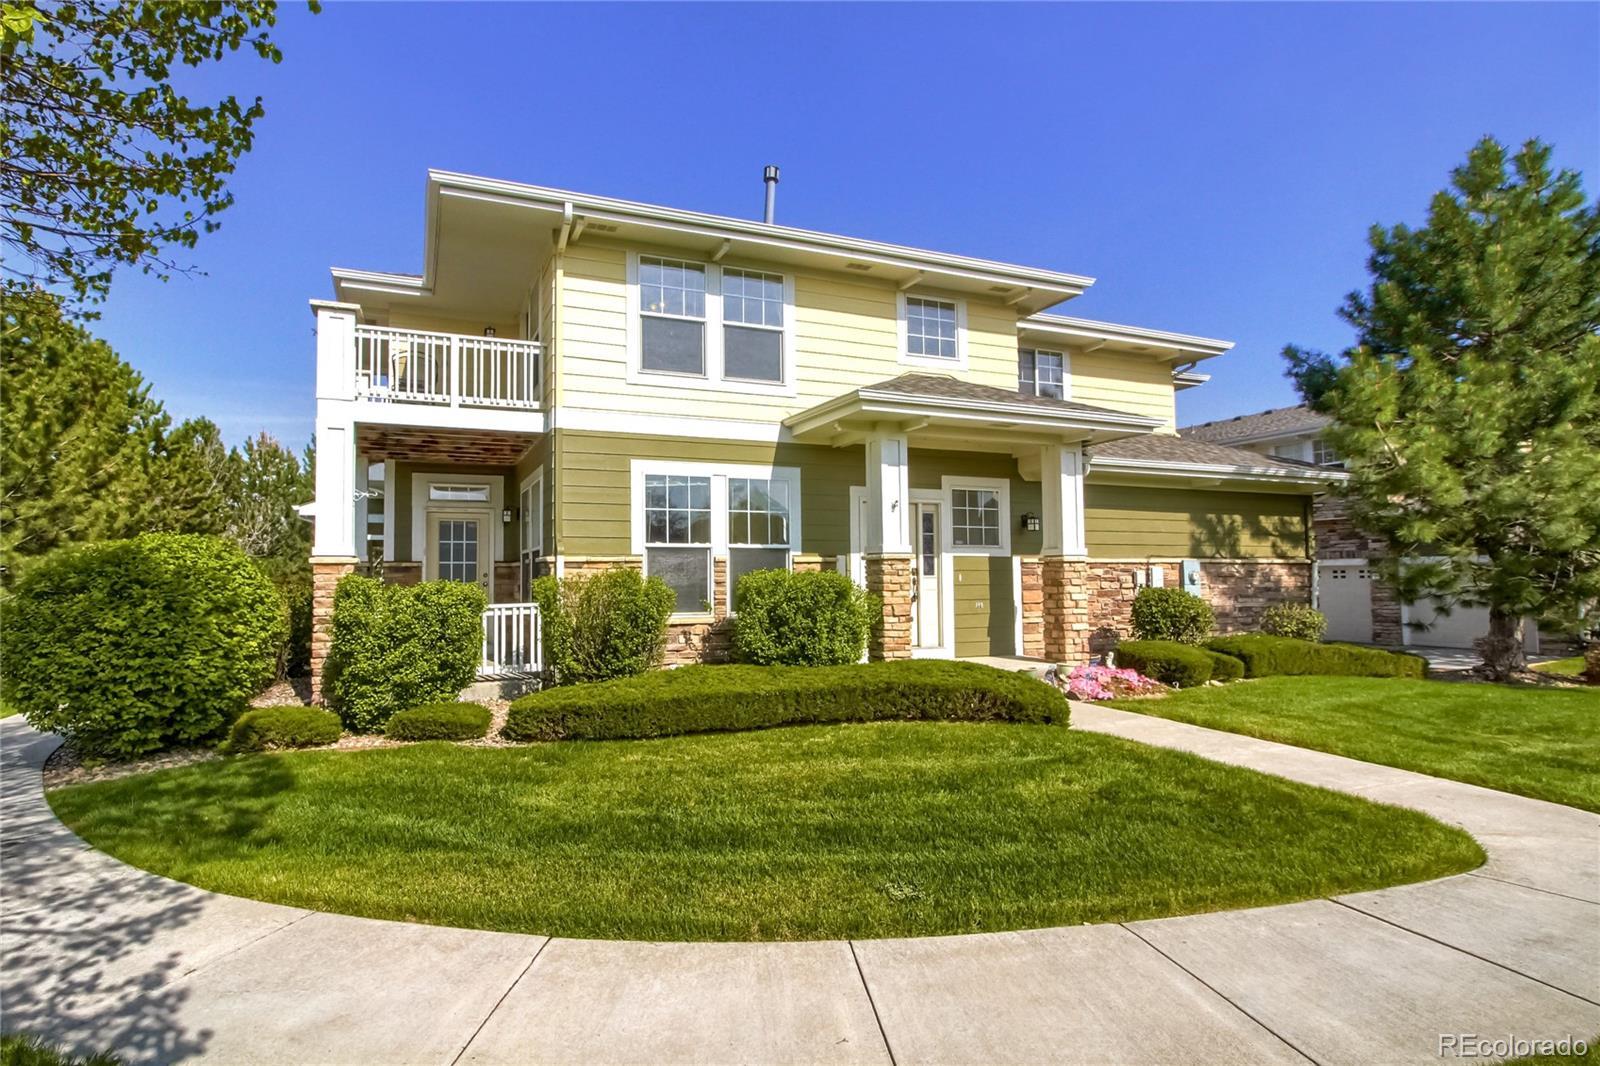 3000 E 112th Avenue #4 Property Photo - Northglenn, CO real estate listing